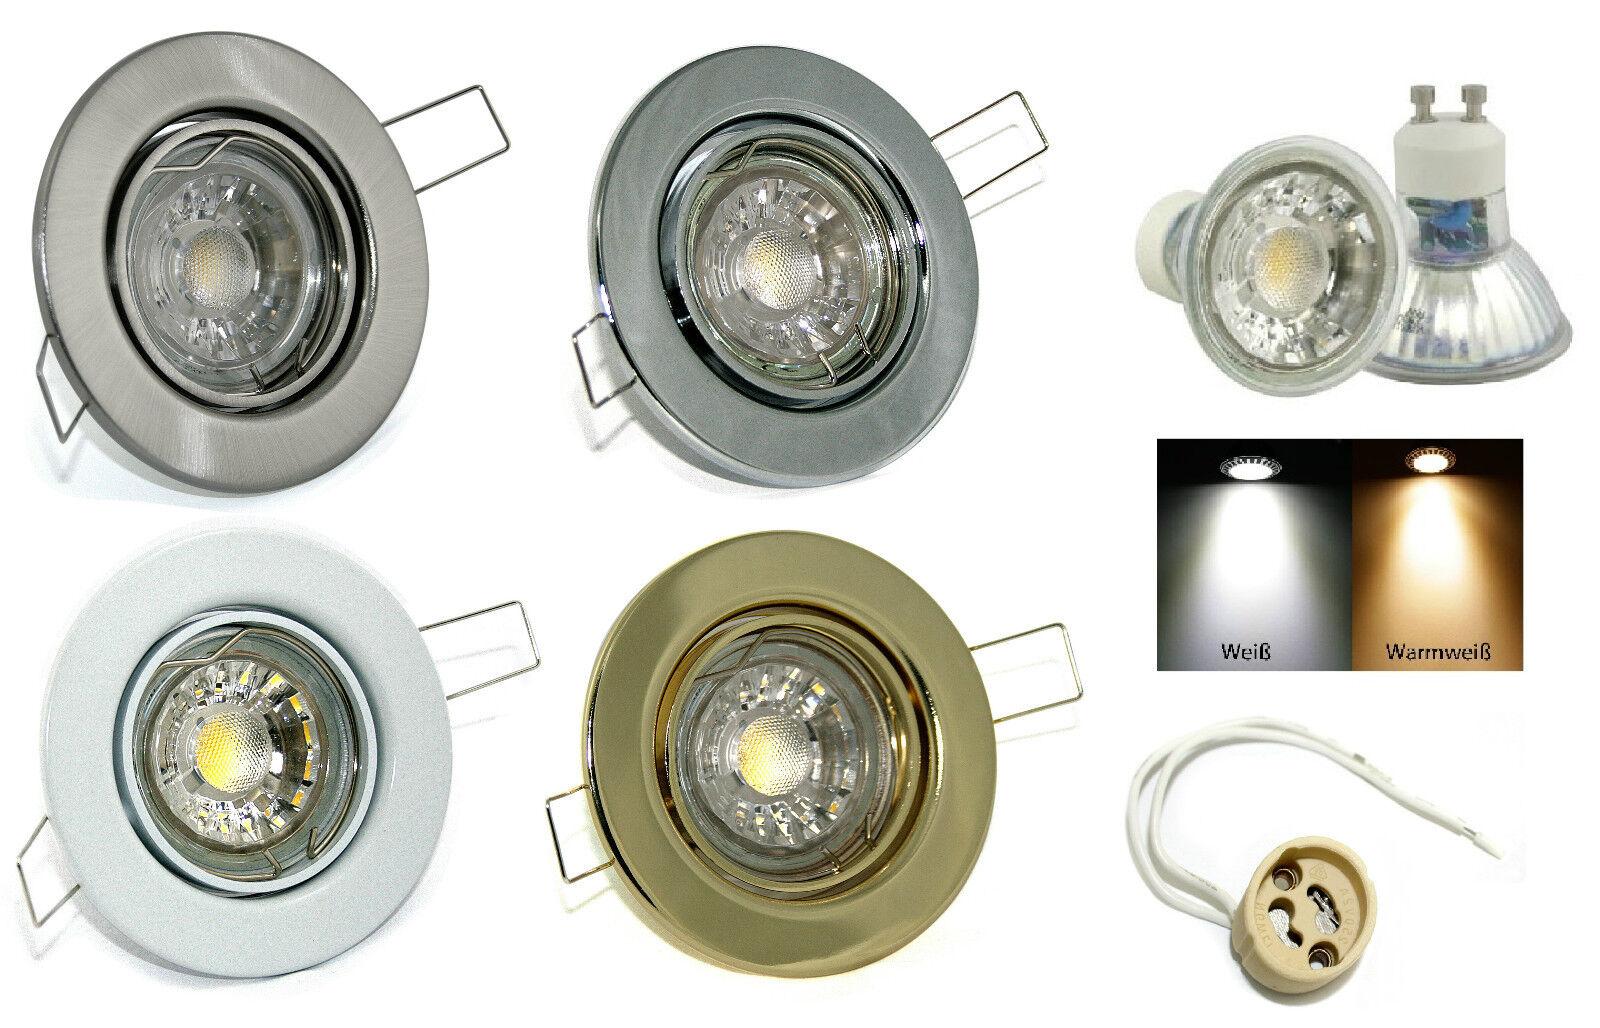 Led Power Reflektor Einbaurahmen Lia 230V 7Watt = 52Watt Fassung GU10 Dimmbar